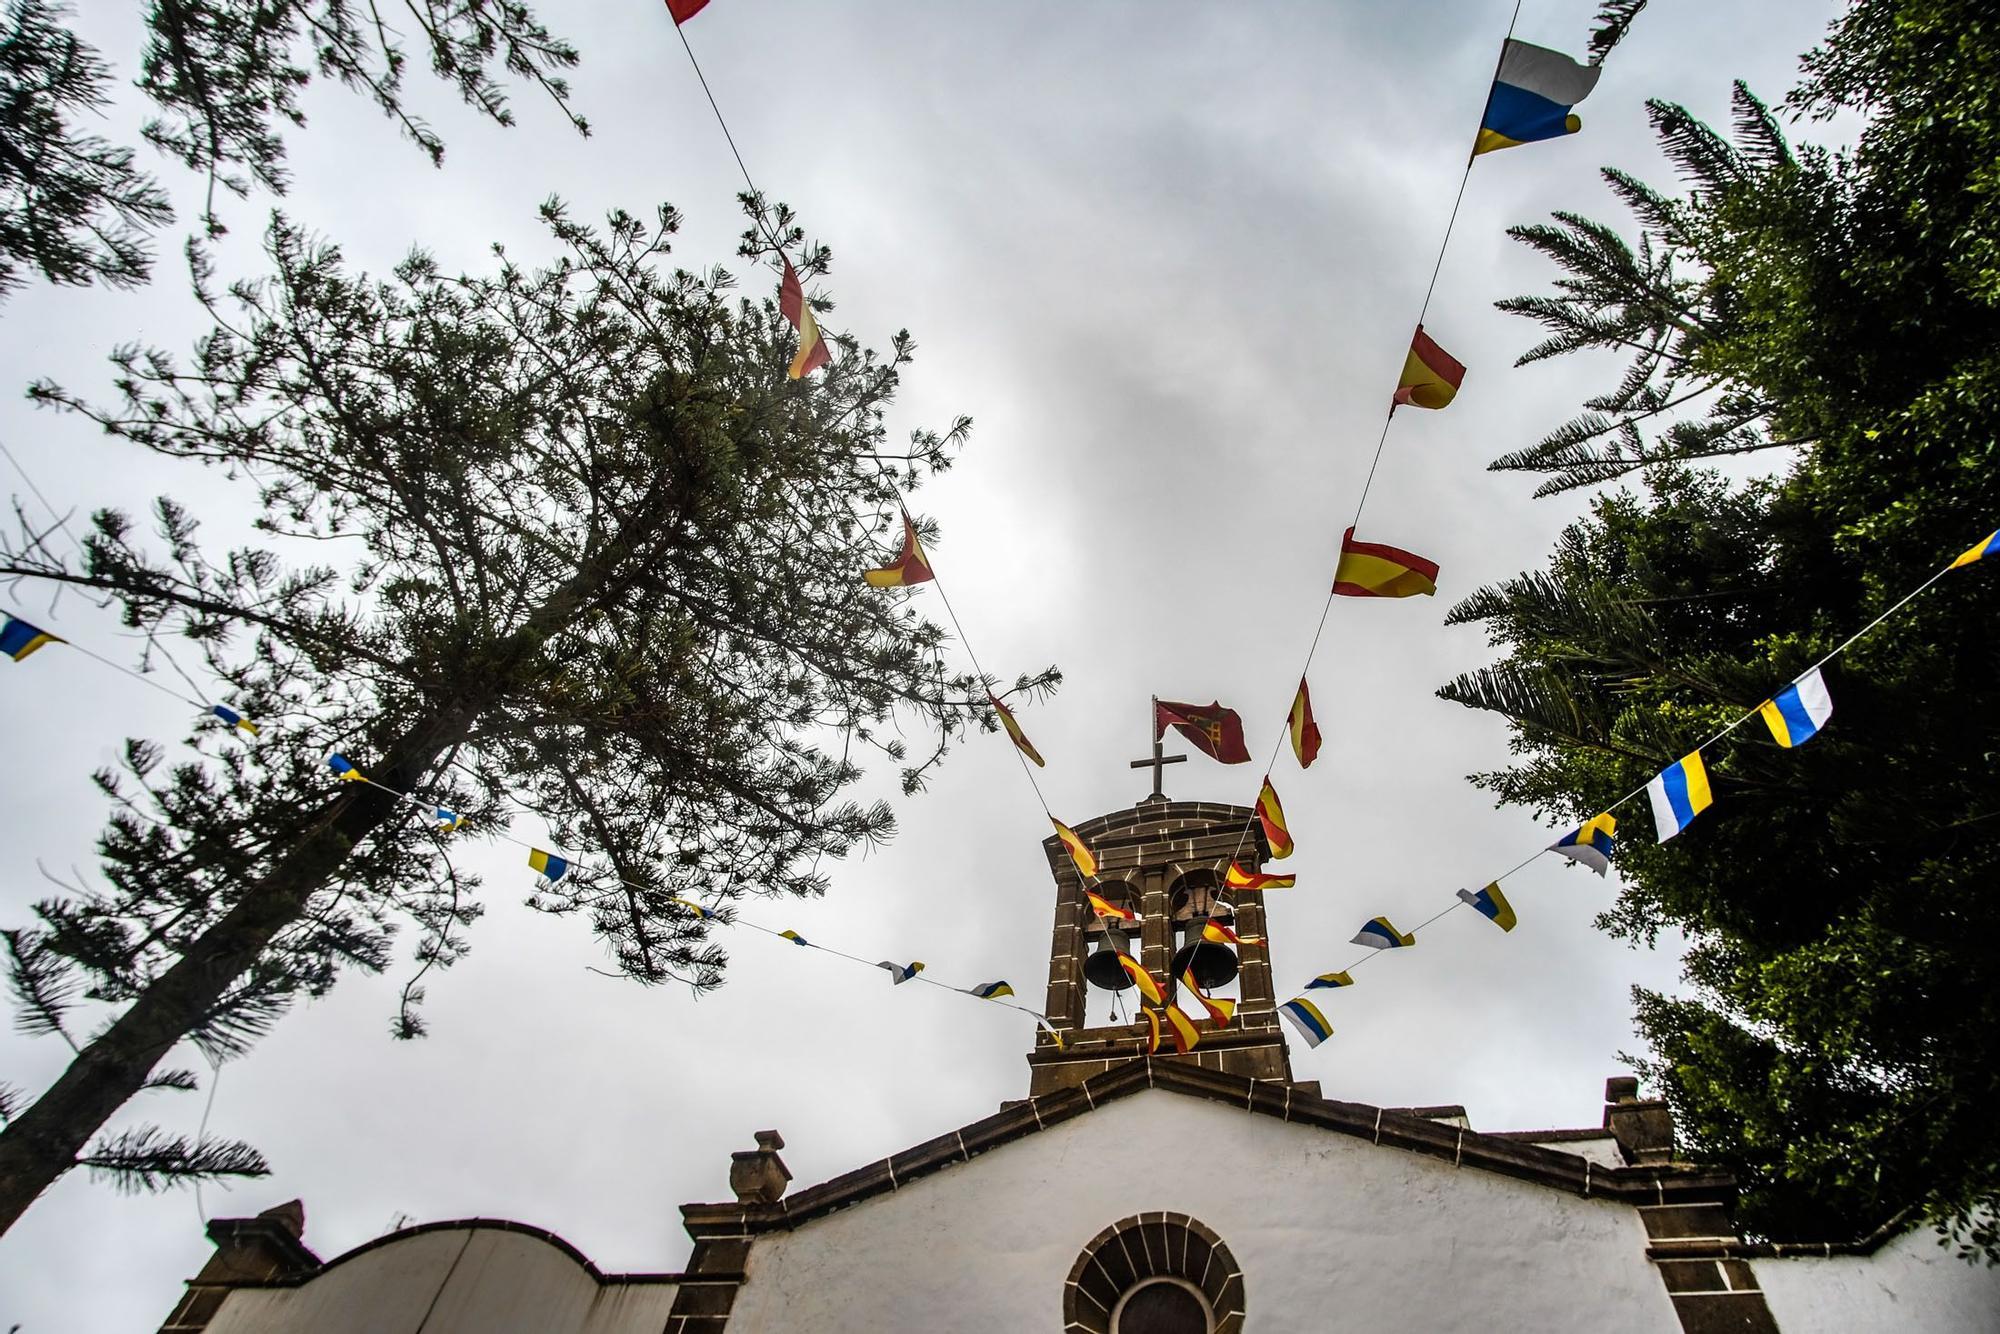 Fiestas patronales de San Lorenzo (01/08/2021)